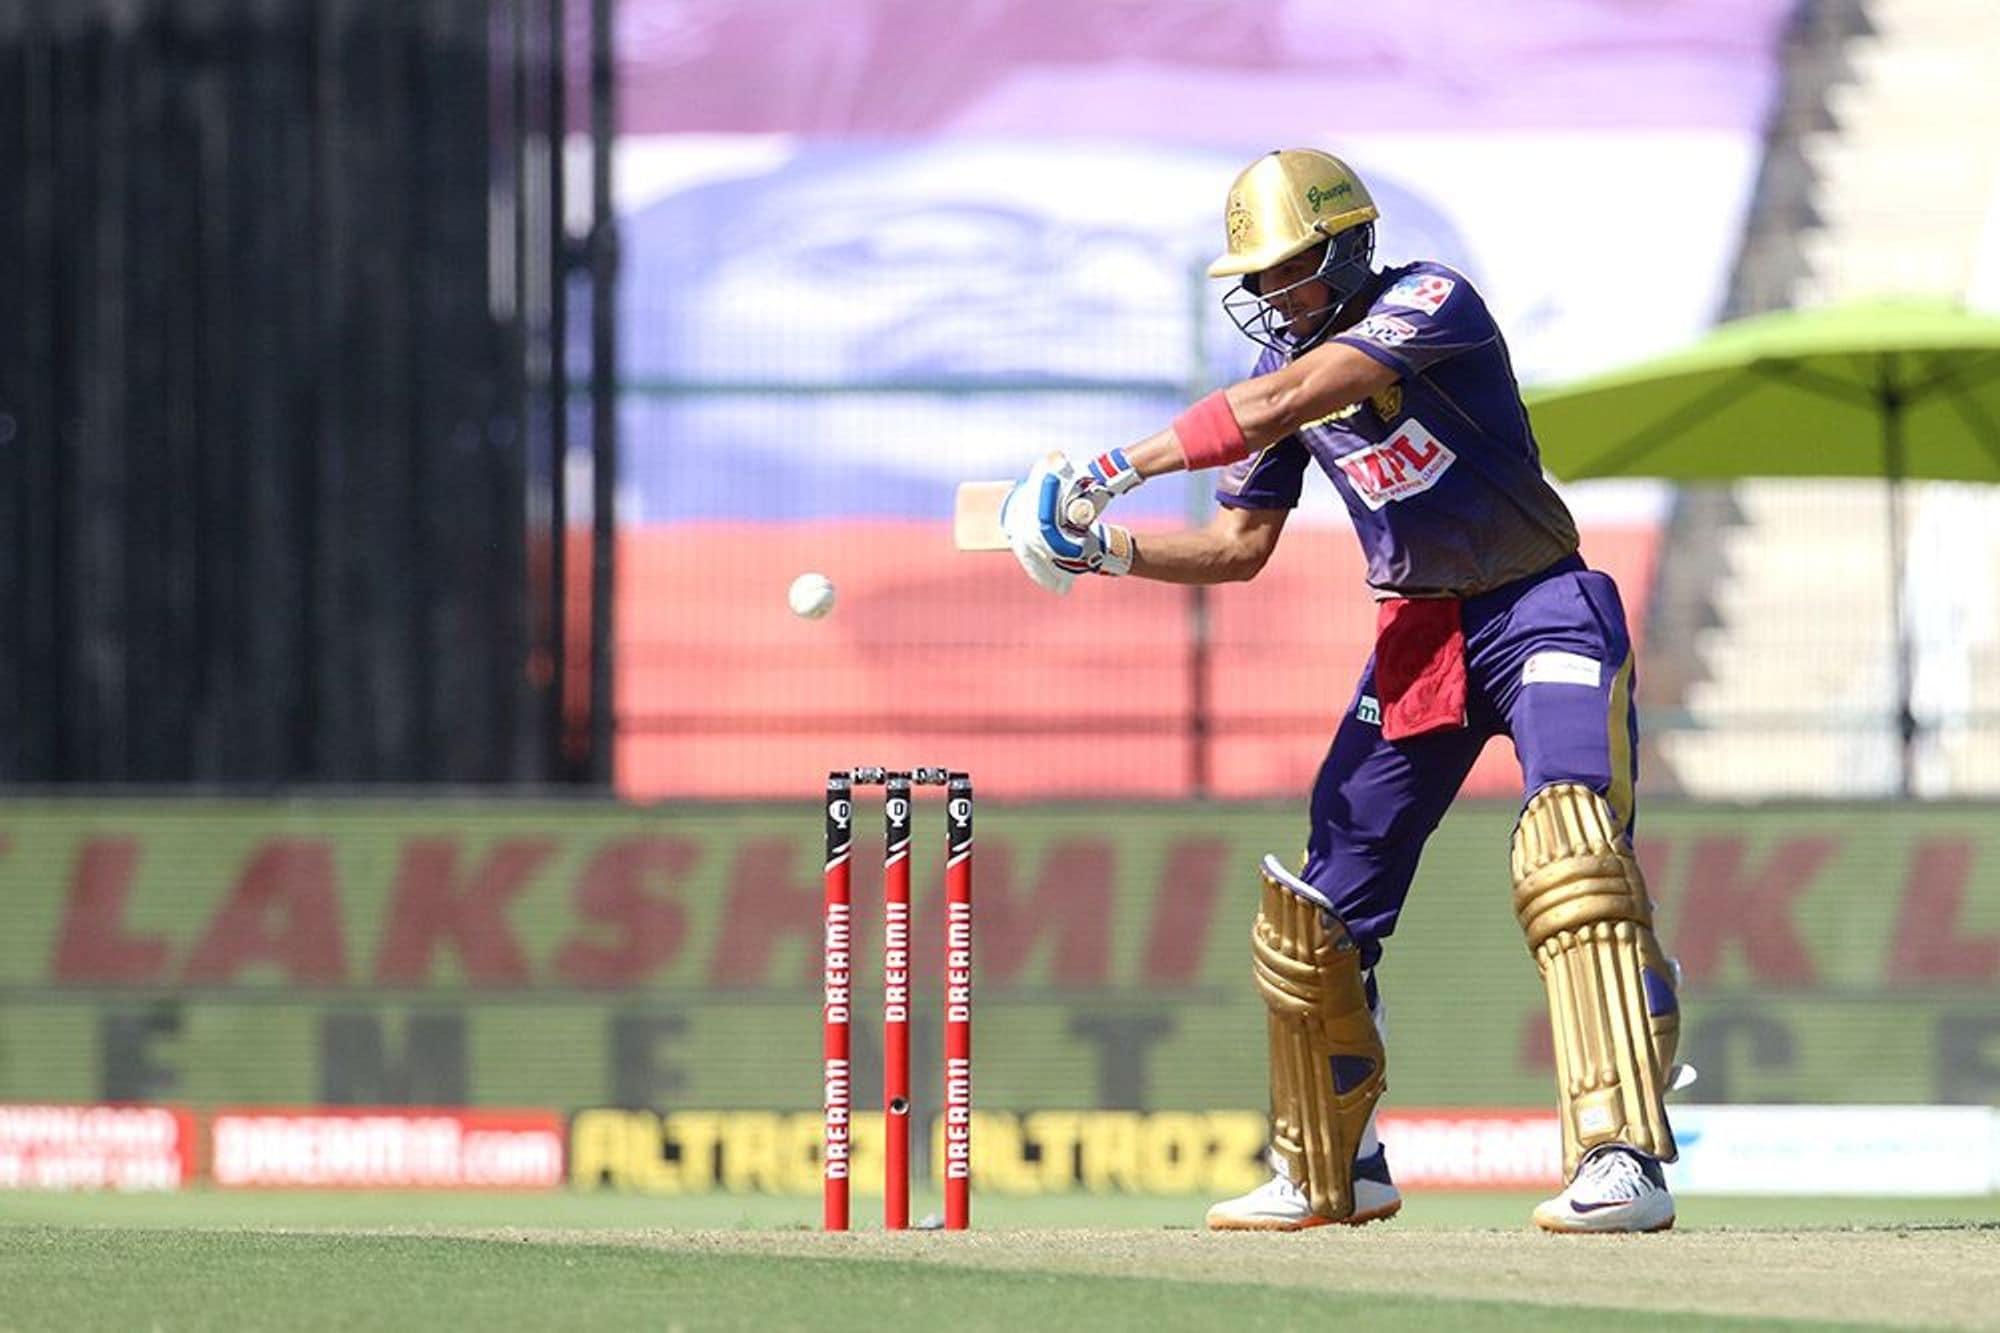 IPL 2020: In Pics, Sunrisers Hyderabad vs Kolkata Knight Riders, Match 35 in Abu Dhabi